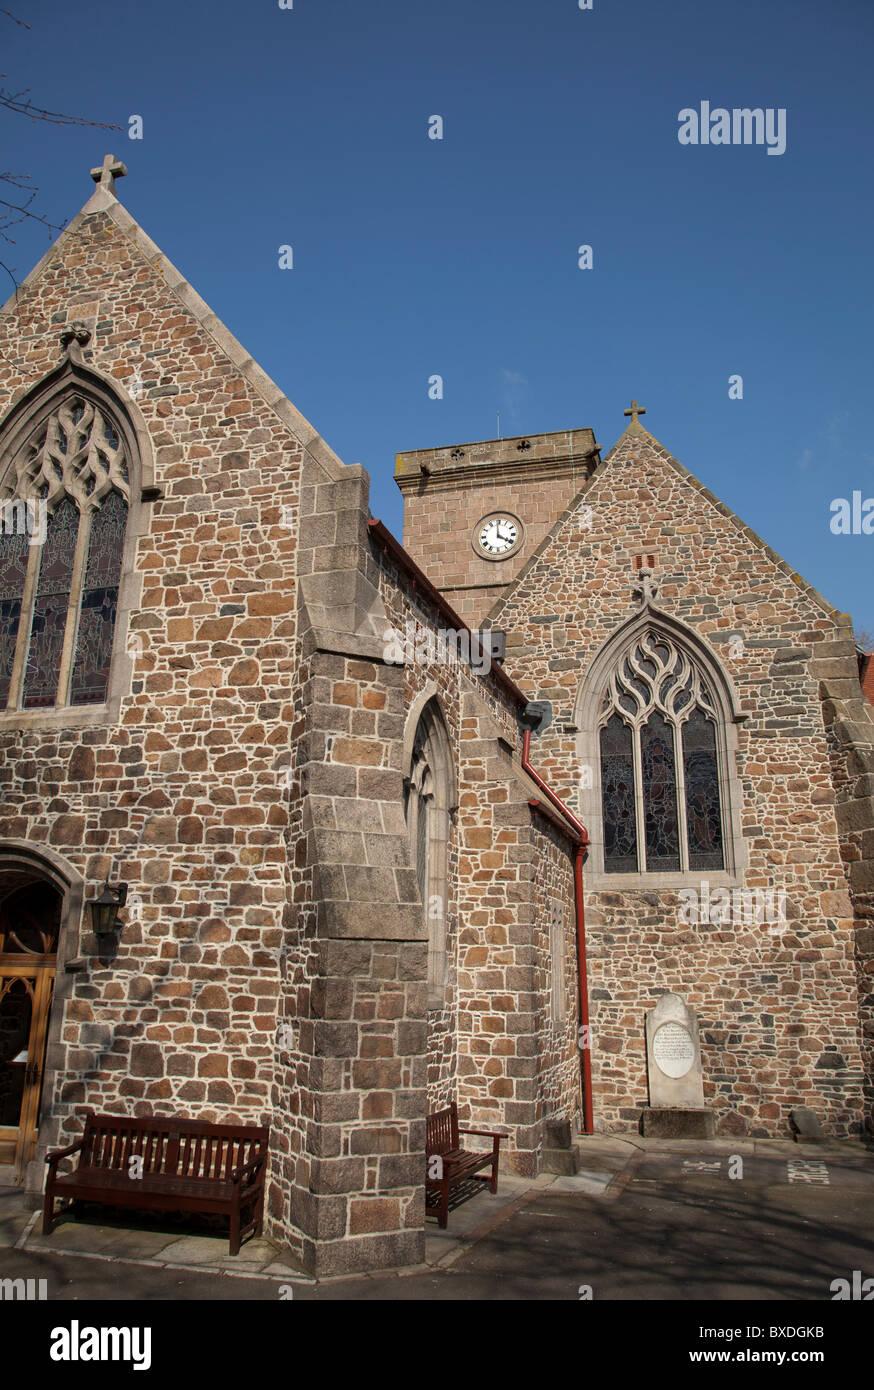 Parish Church of St Helier Jersey Stock Photo - Alamy